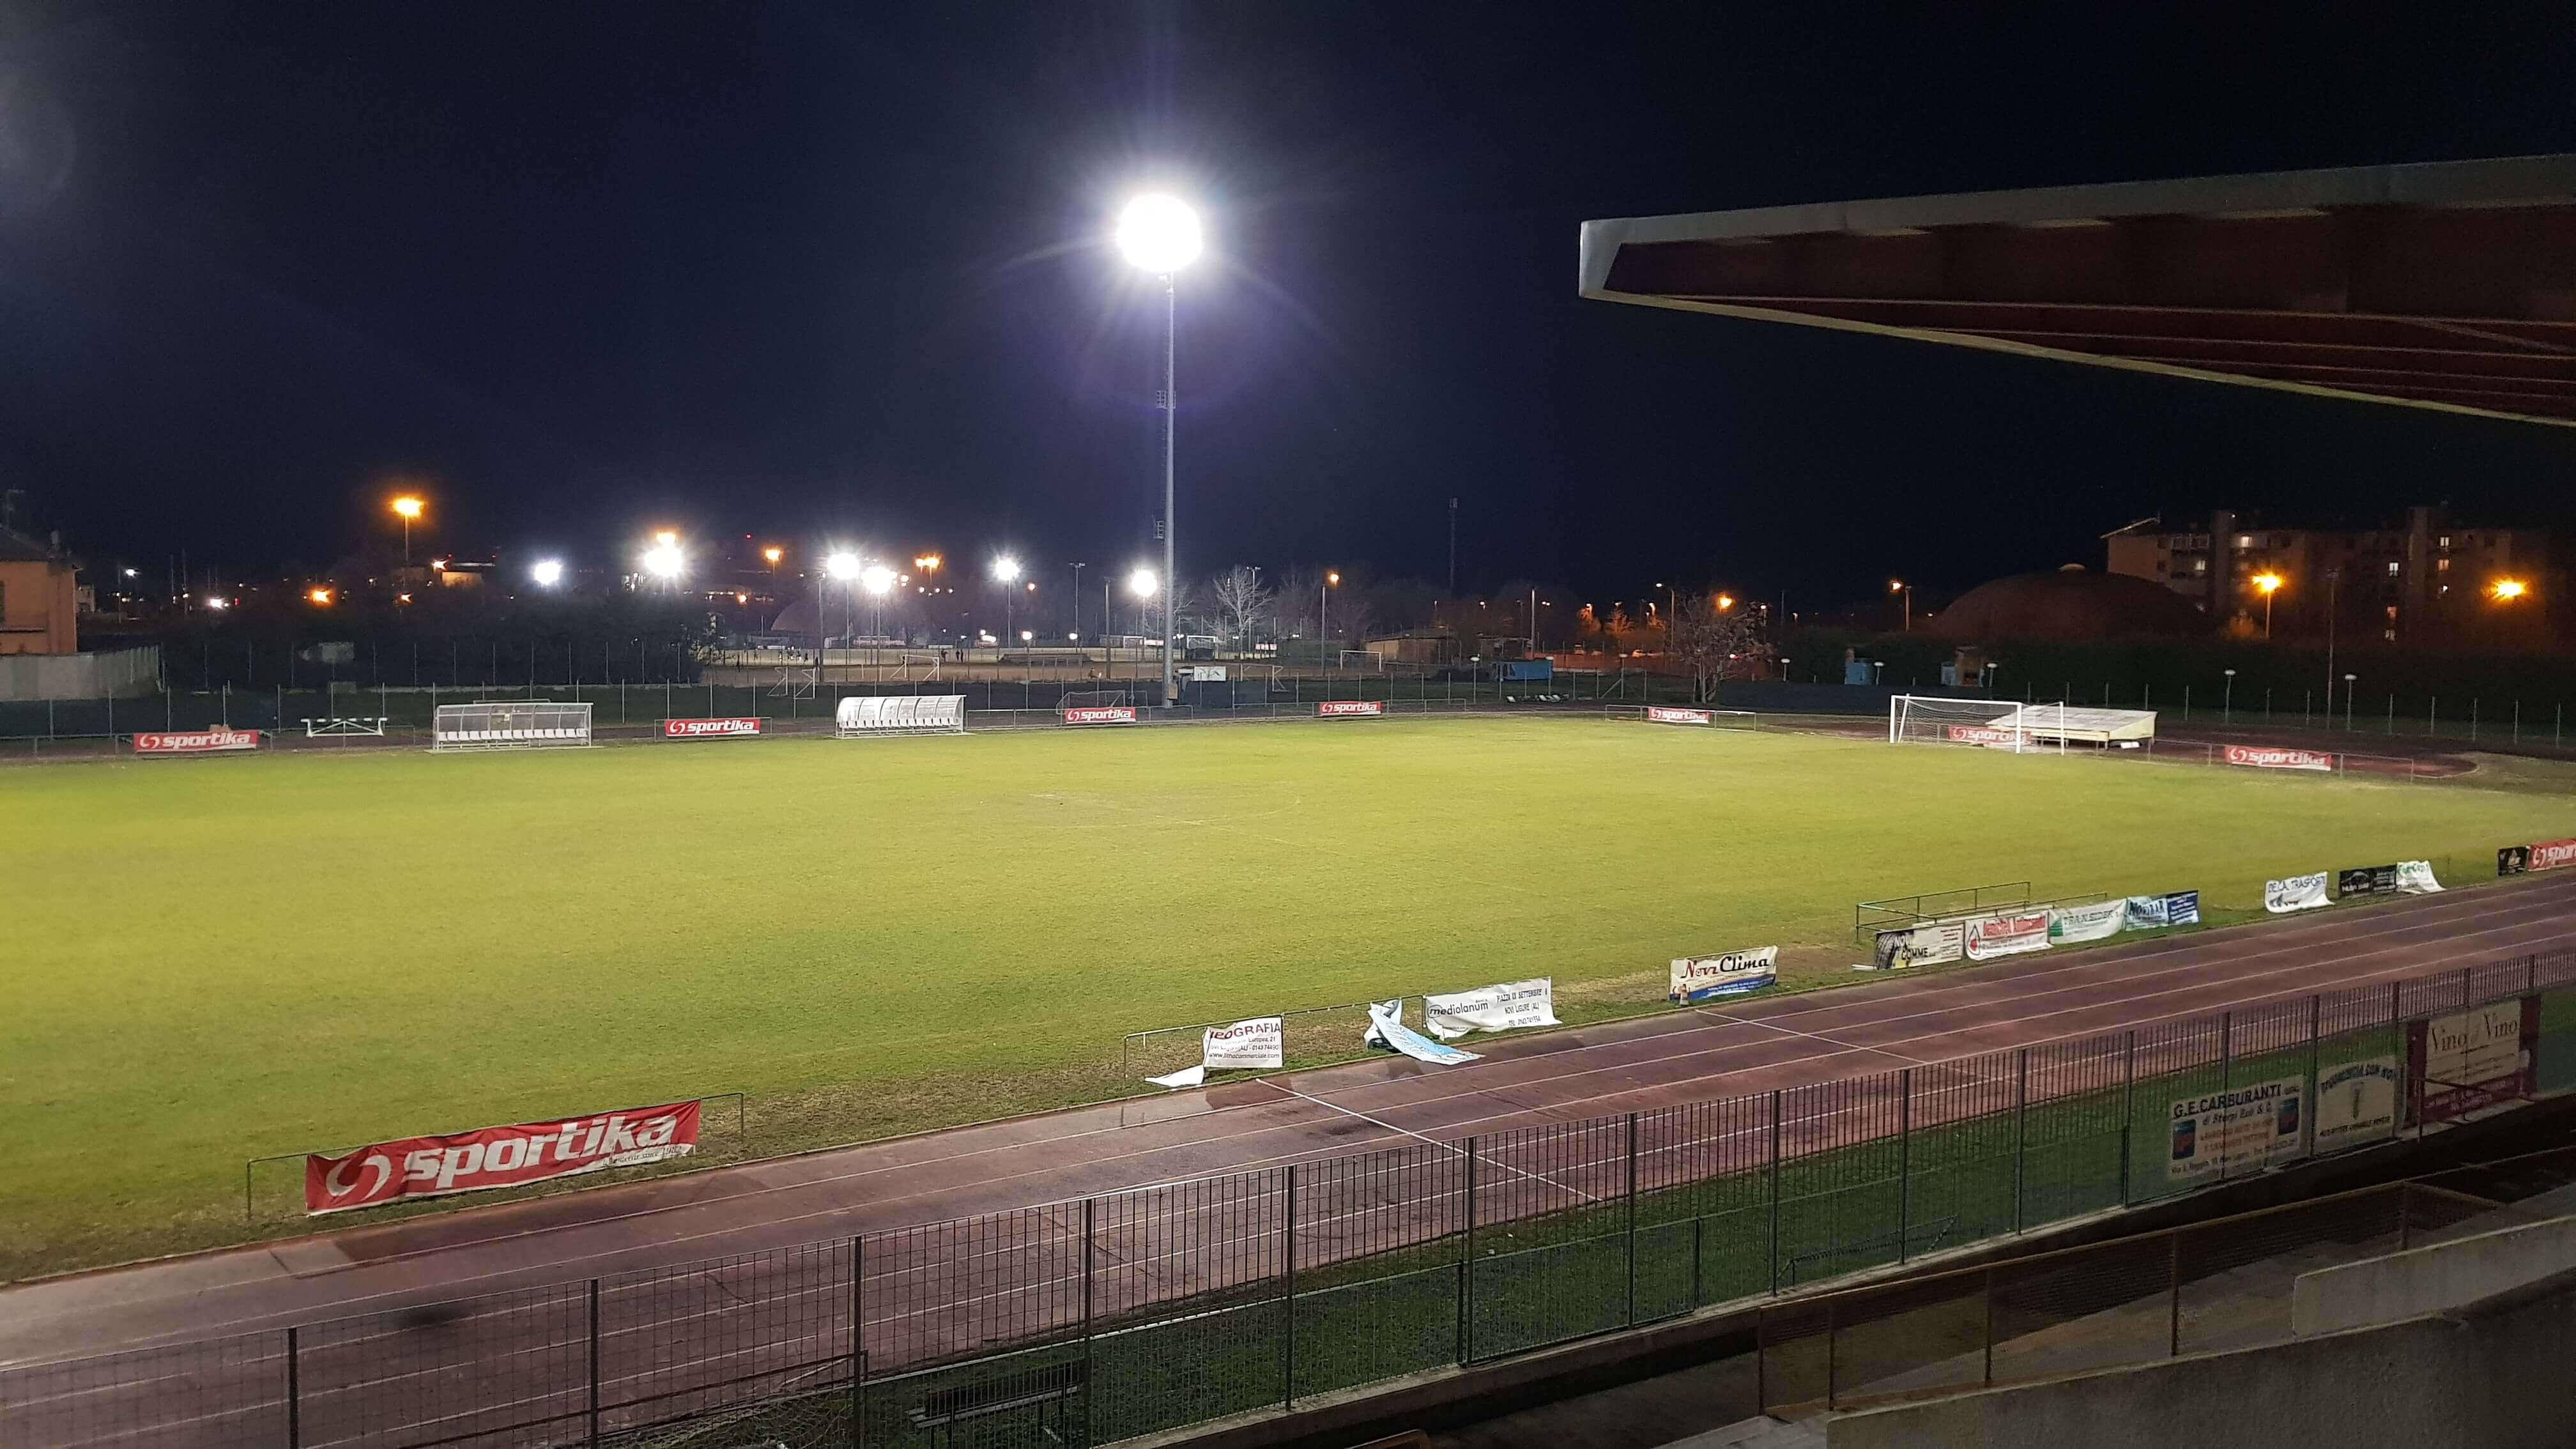 Stadio-costante-girardengo-novi-ligure-al-1